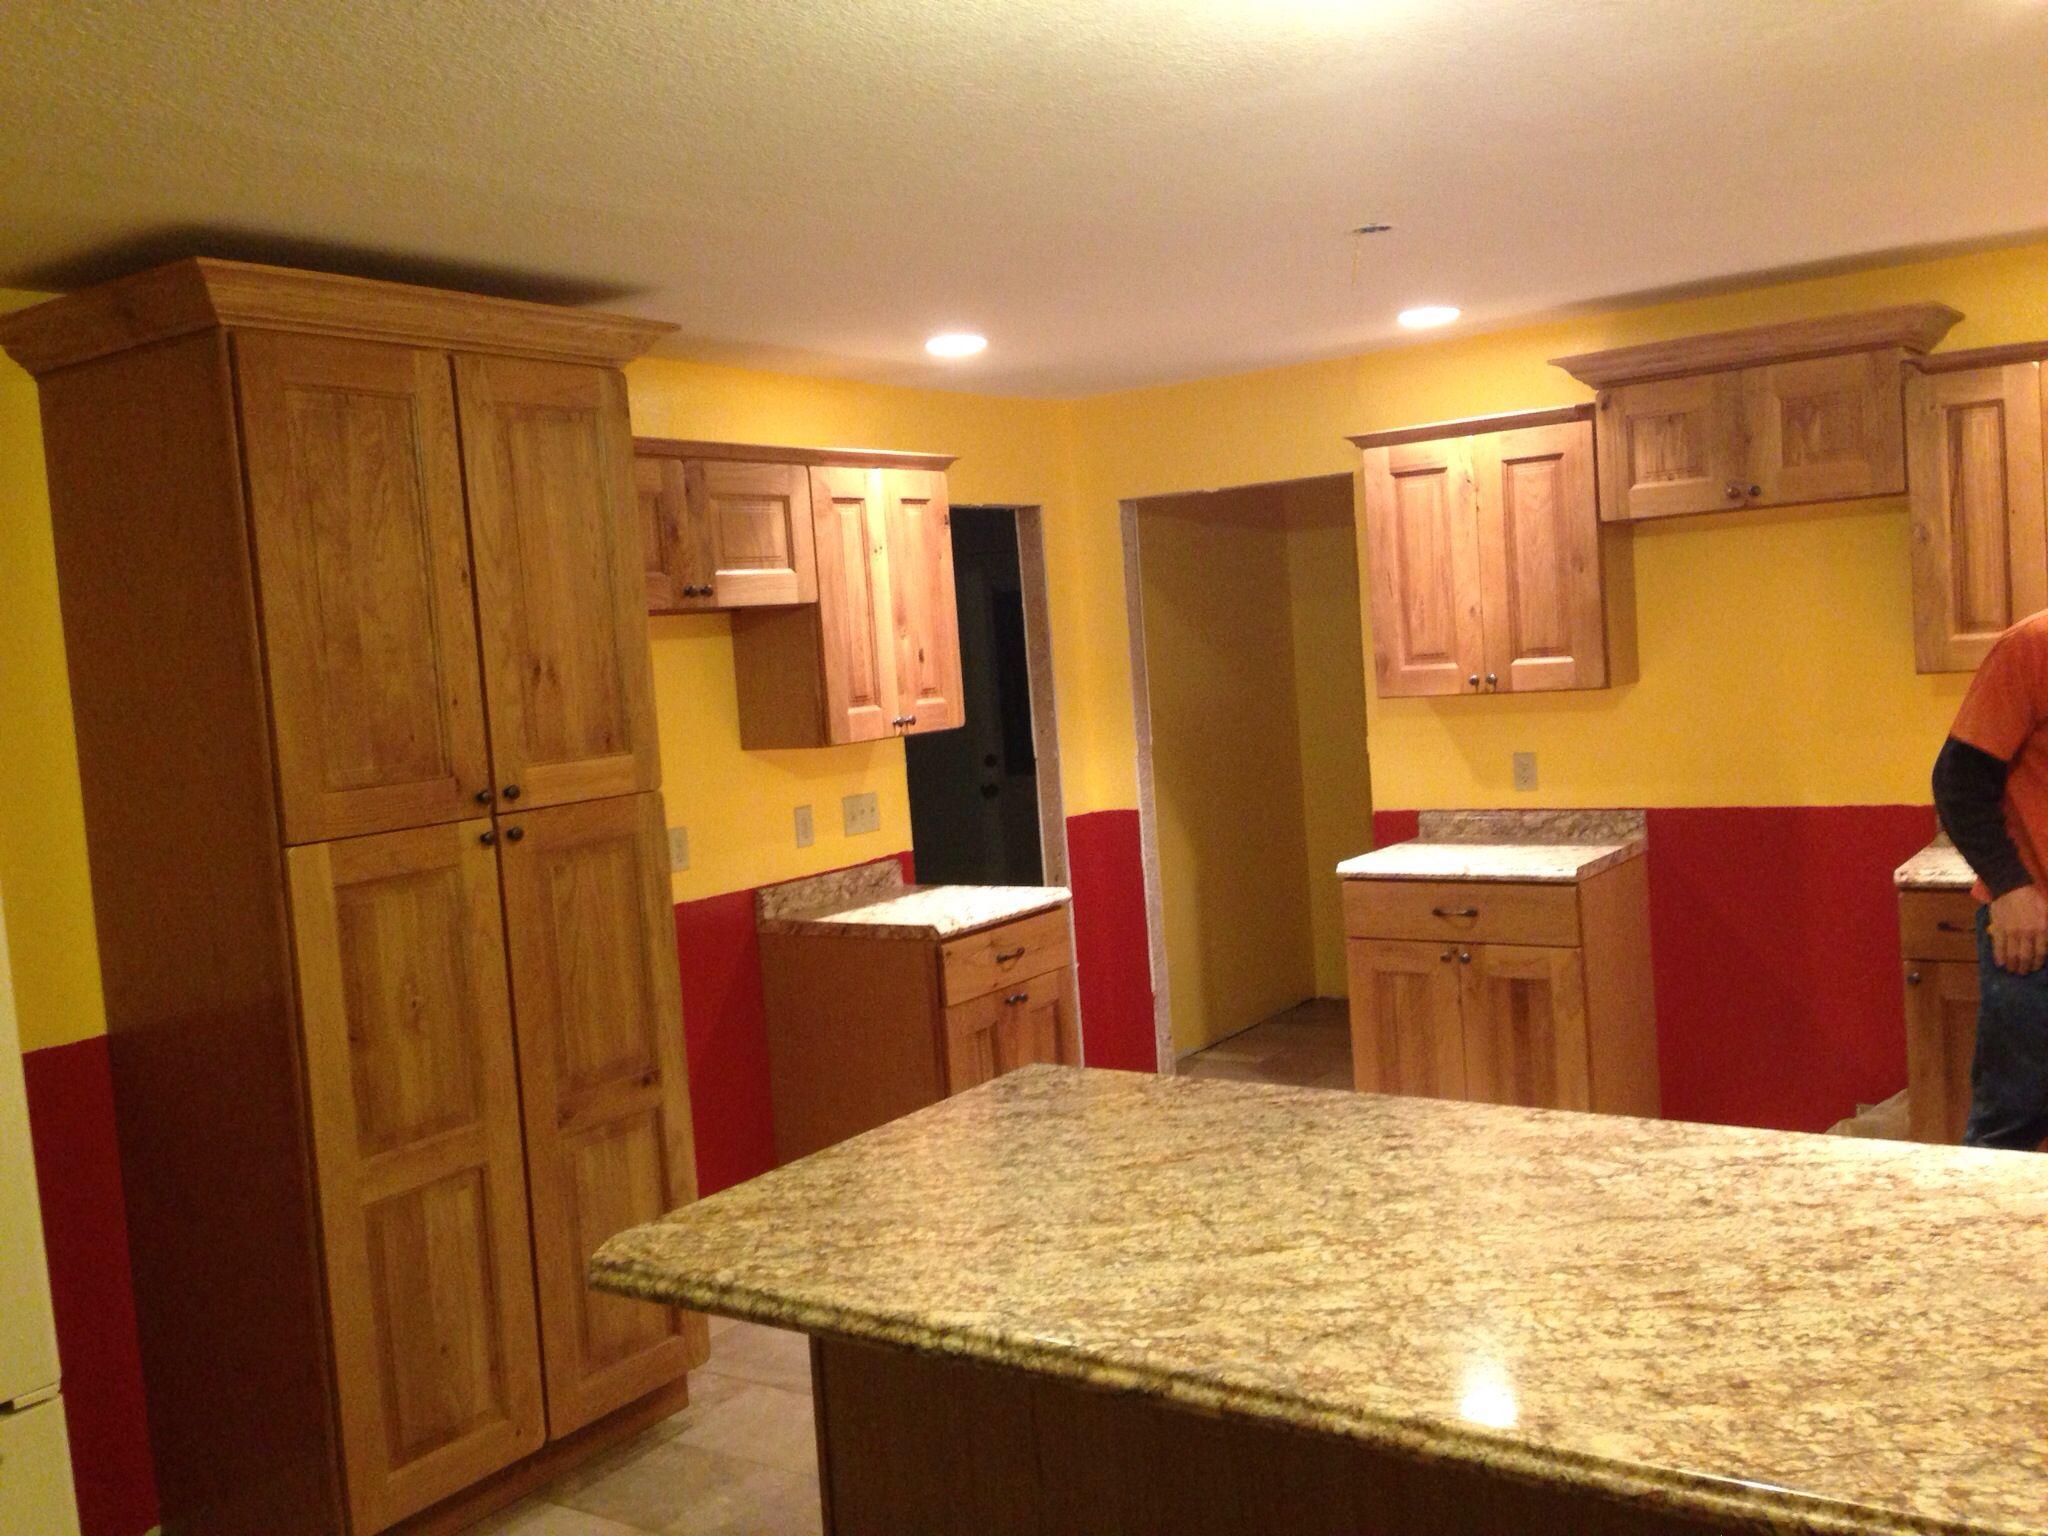 Rustic Knotty Oak Kitchen Cabinets Two Tone Kitchen Cabinets Oak Kitchen Oak Kitchen Cabinets